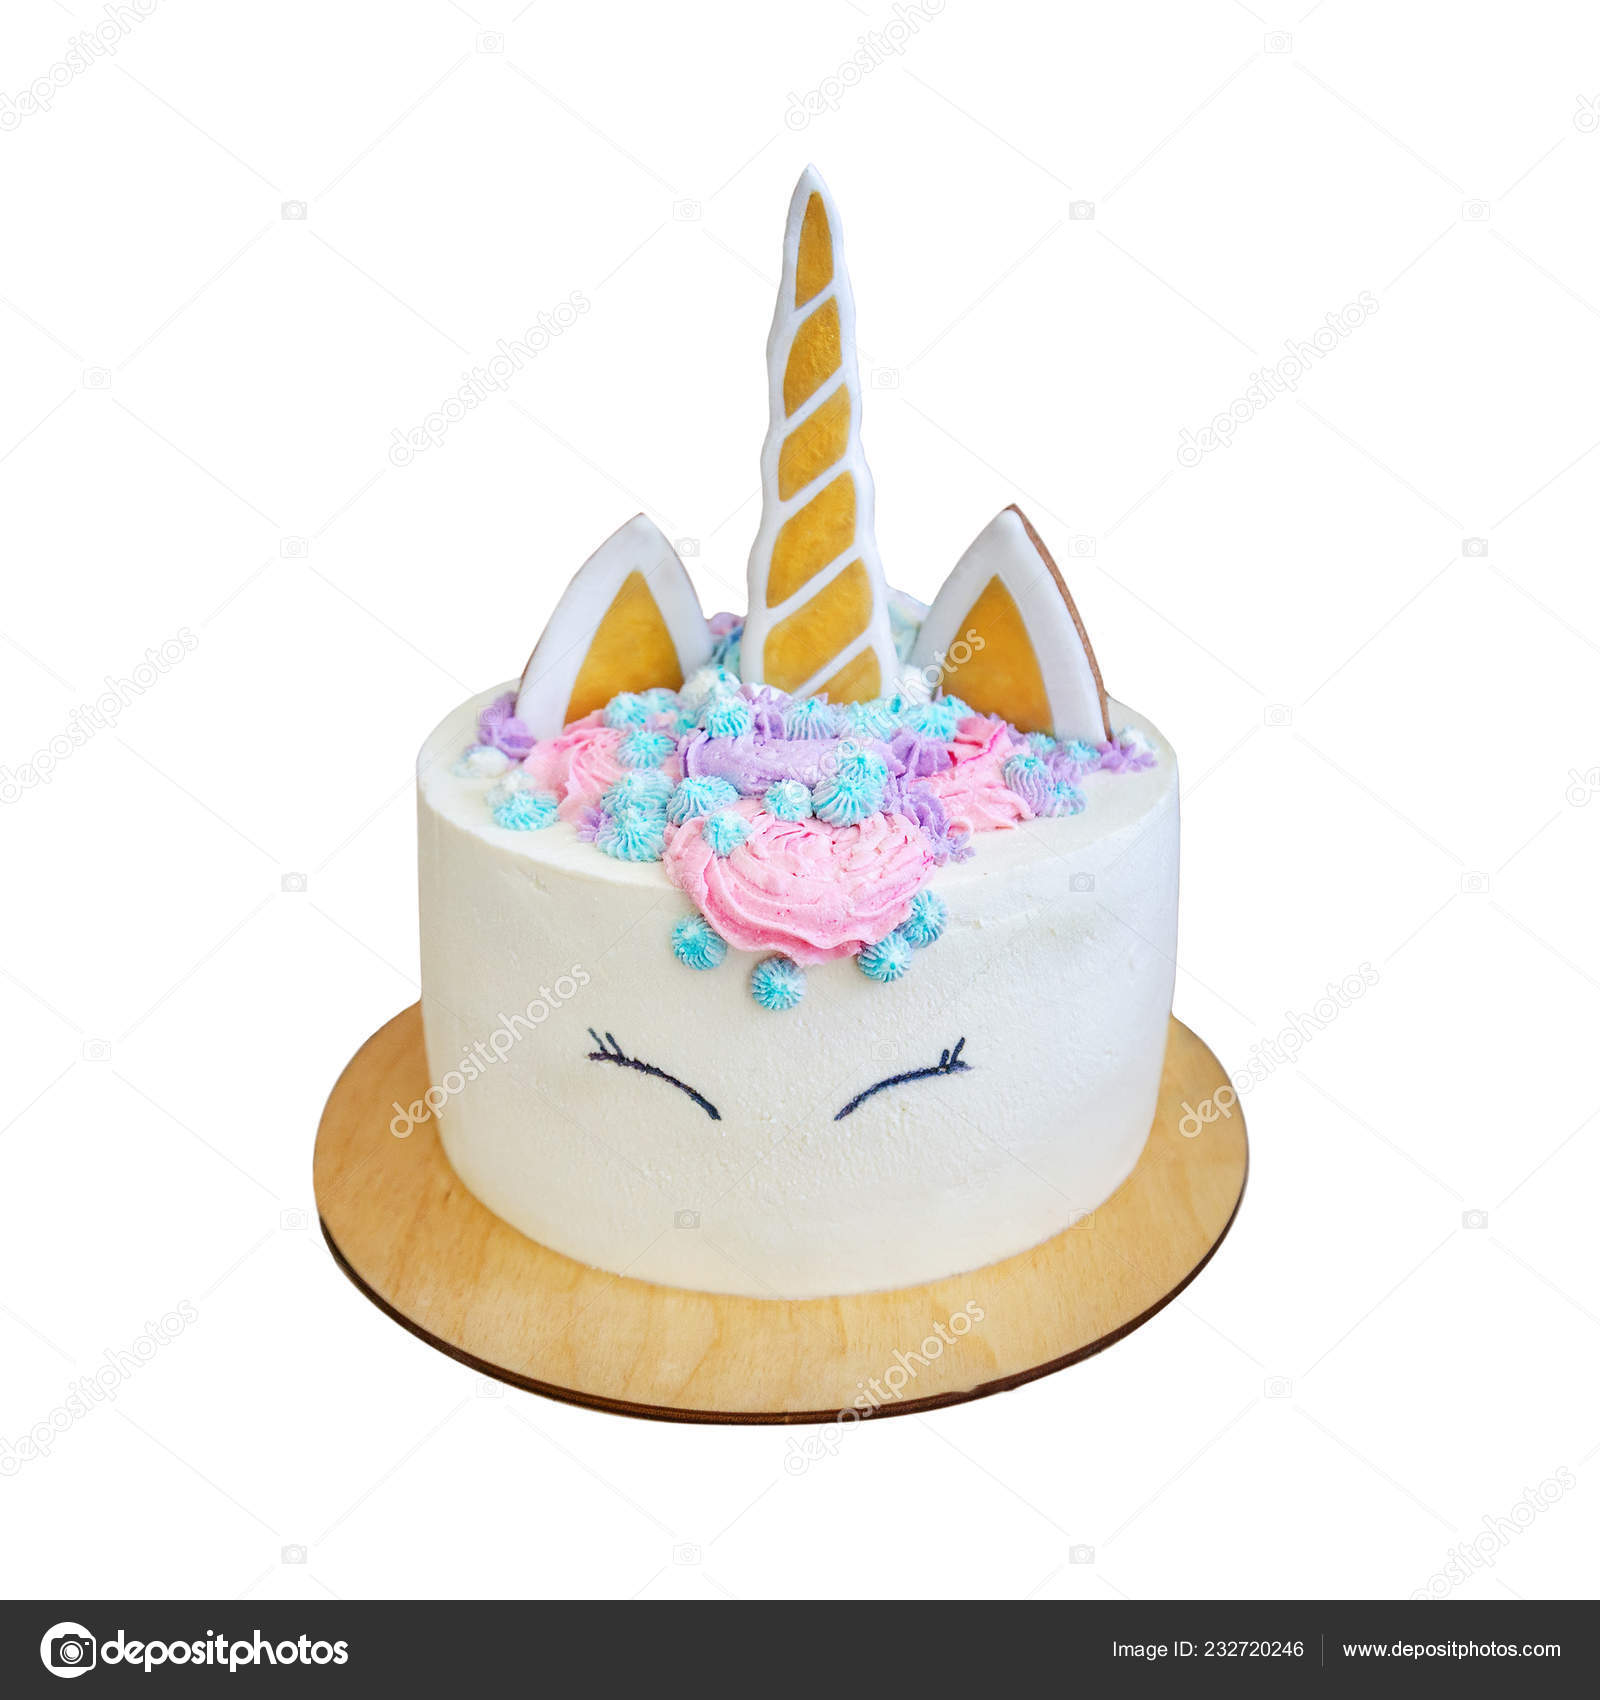 Birthday Cake For Girls.Beautiful Bright Delicious Birthday Cake Girls Decorated